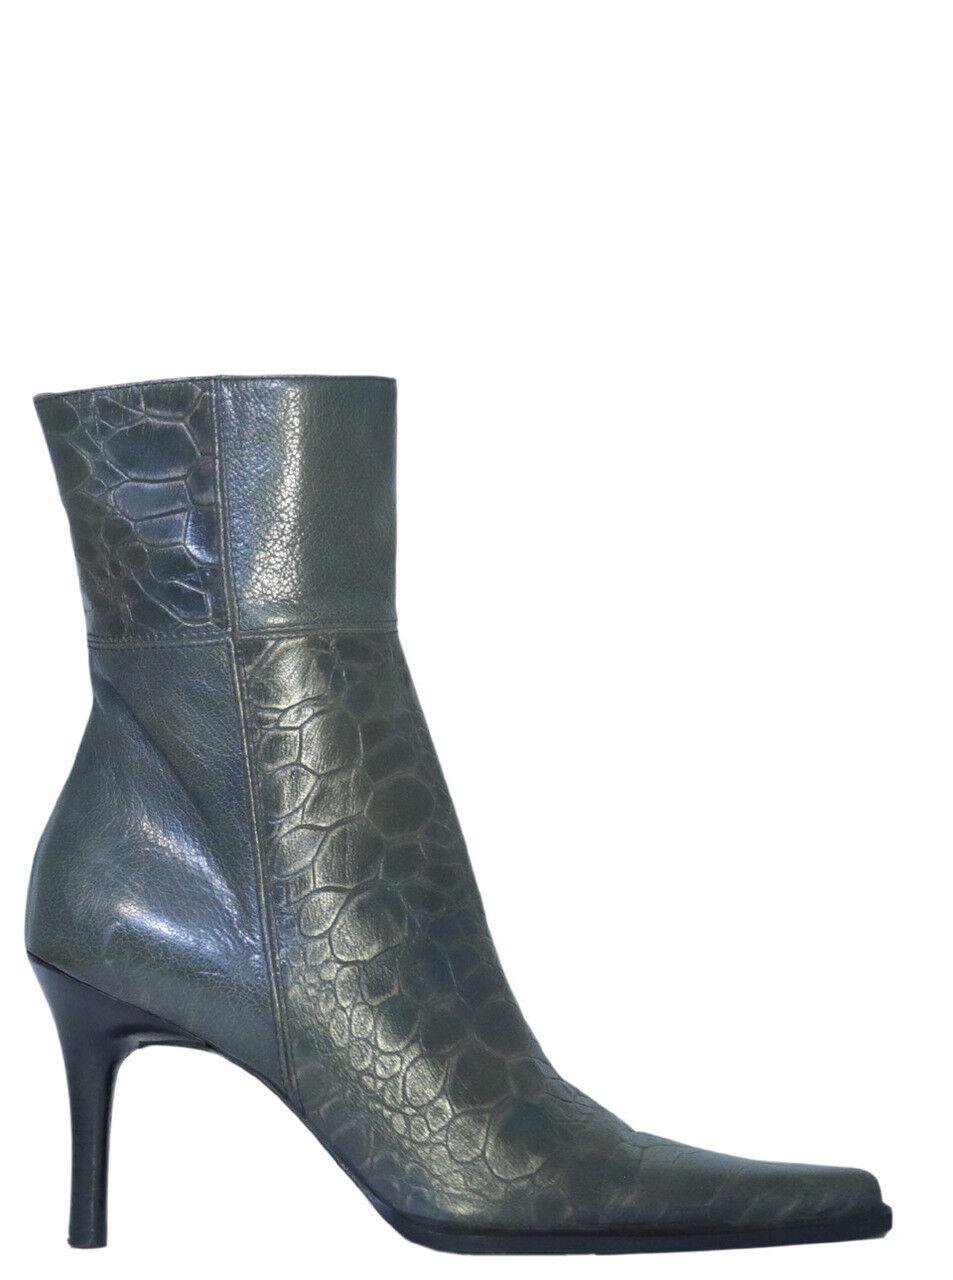 Man/Woman Caiman 6050 Women's Ankle Boots Blue Elegant shape New style Export